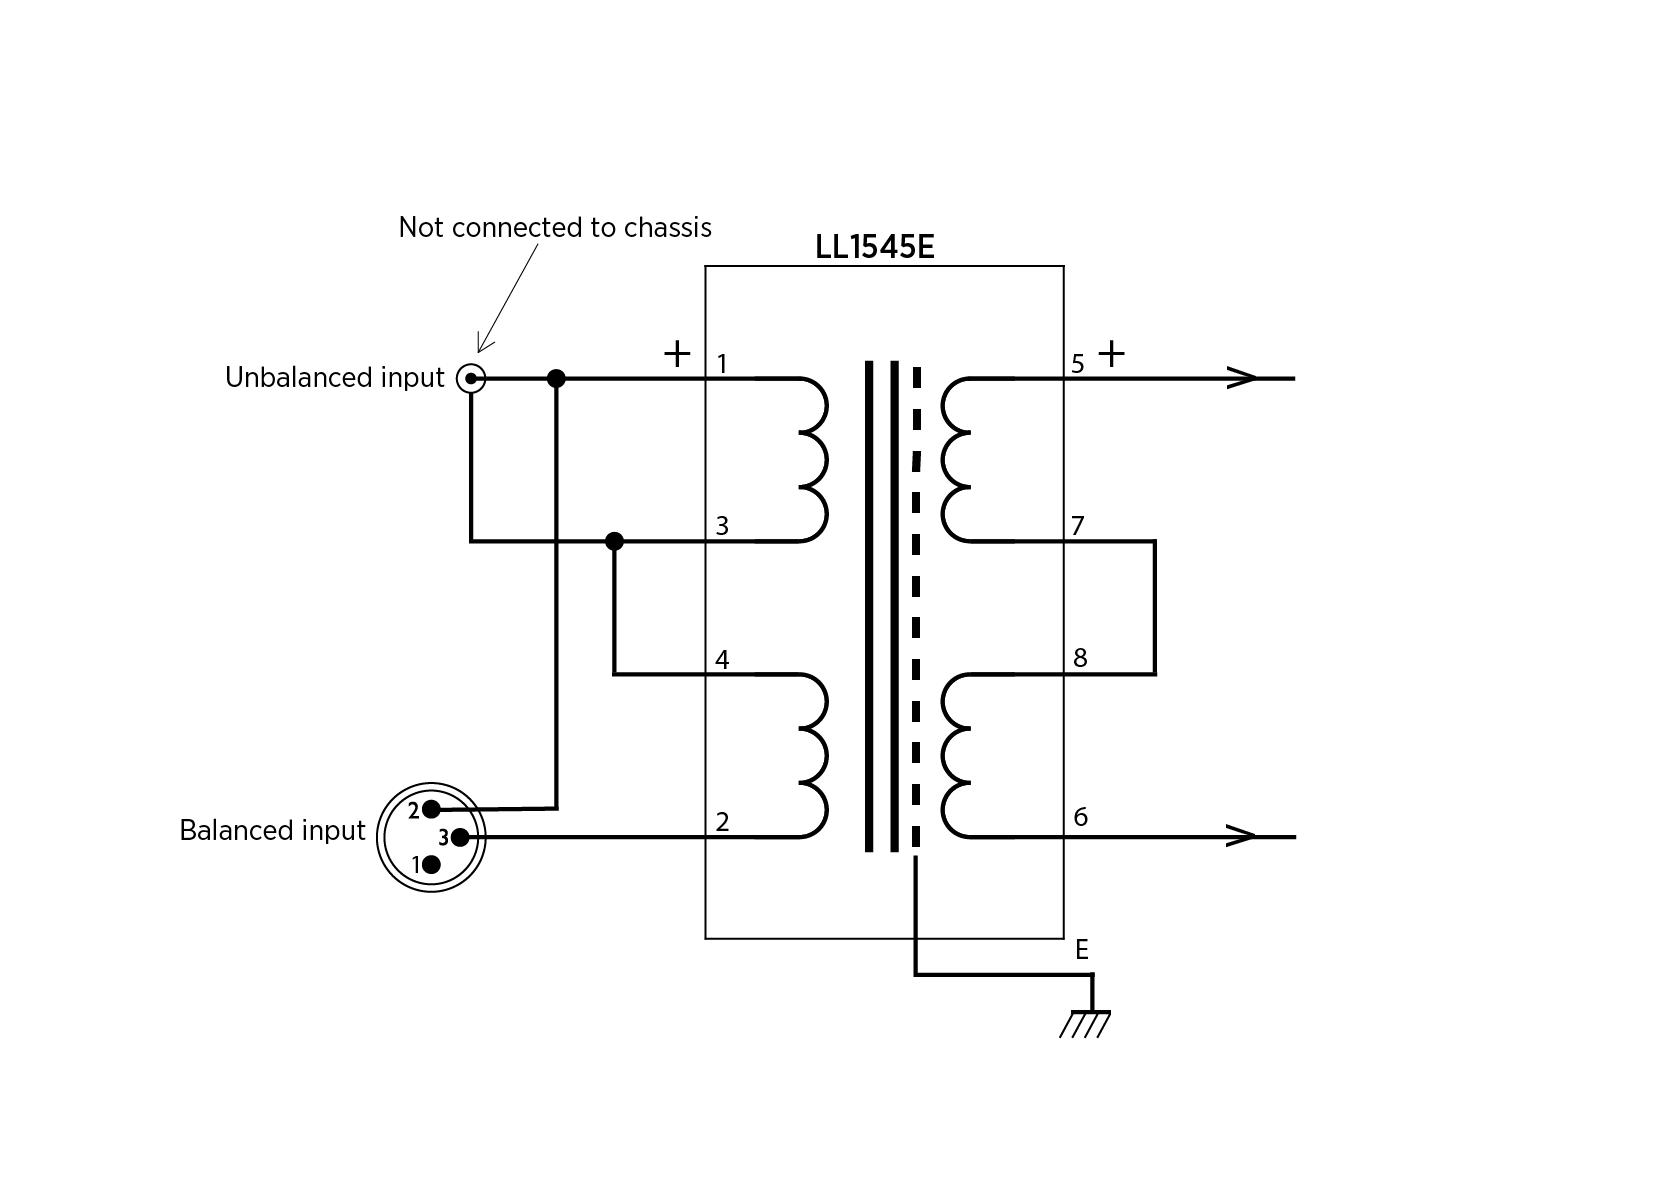 Using the LL1545E